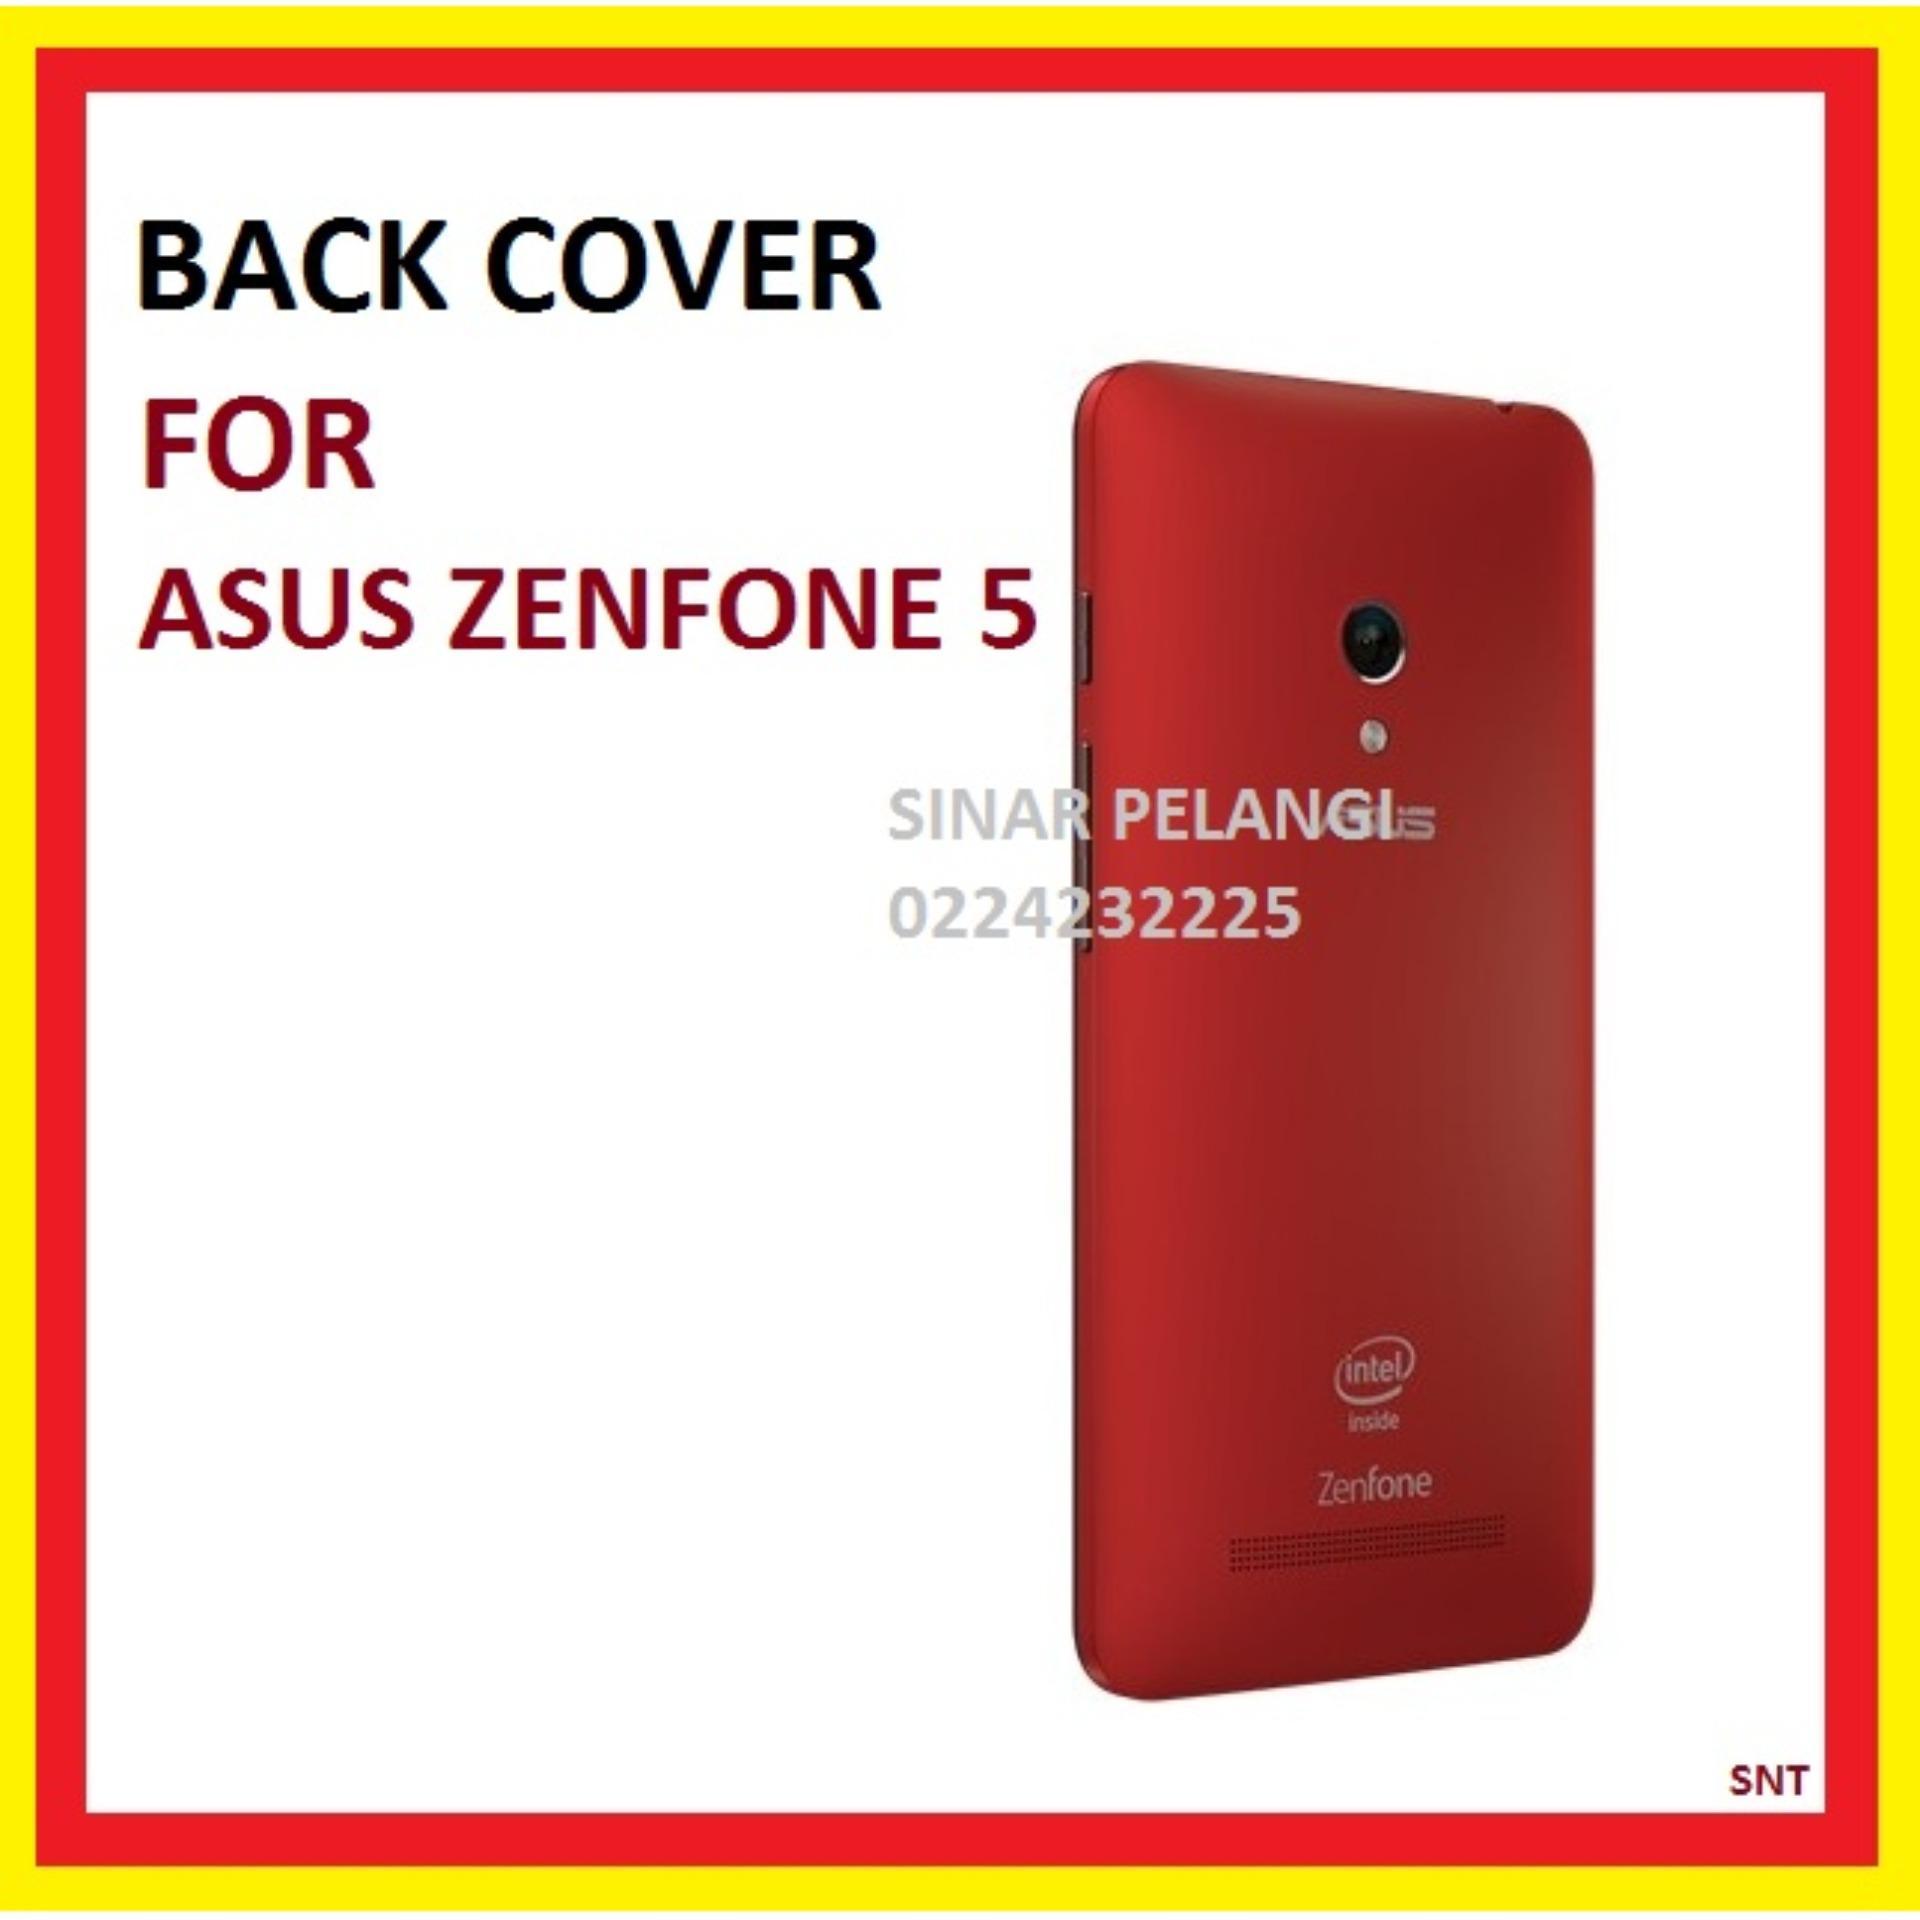 ASUS ZENFONE 5 A500CG A501CG T00J T00F A500 RED BACK COVER BATTERY COVER TUTUP BATERAI PENUTUP BELA